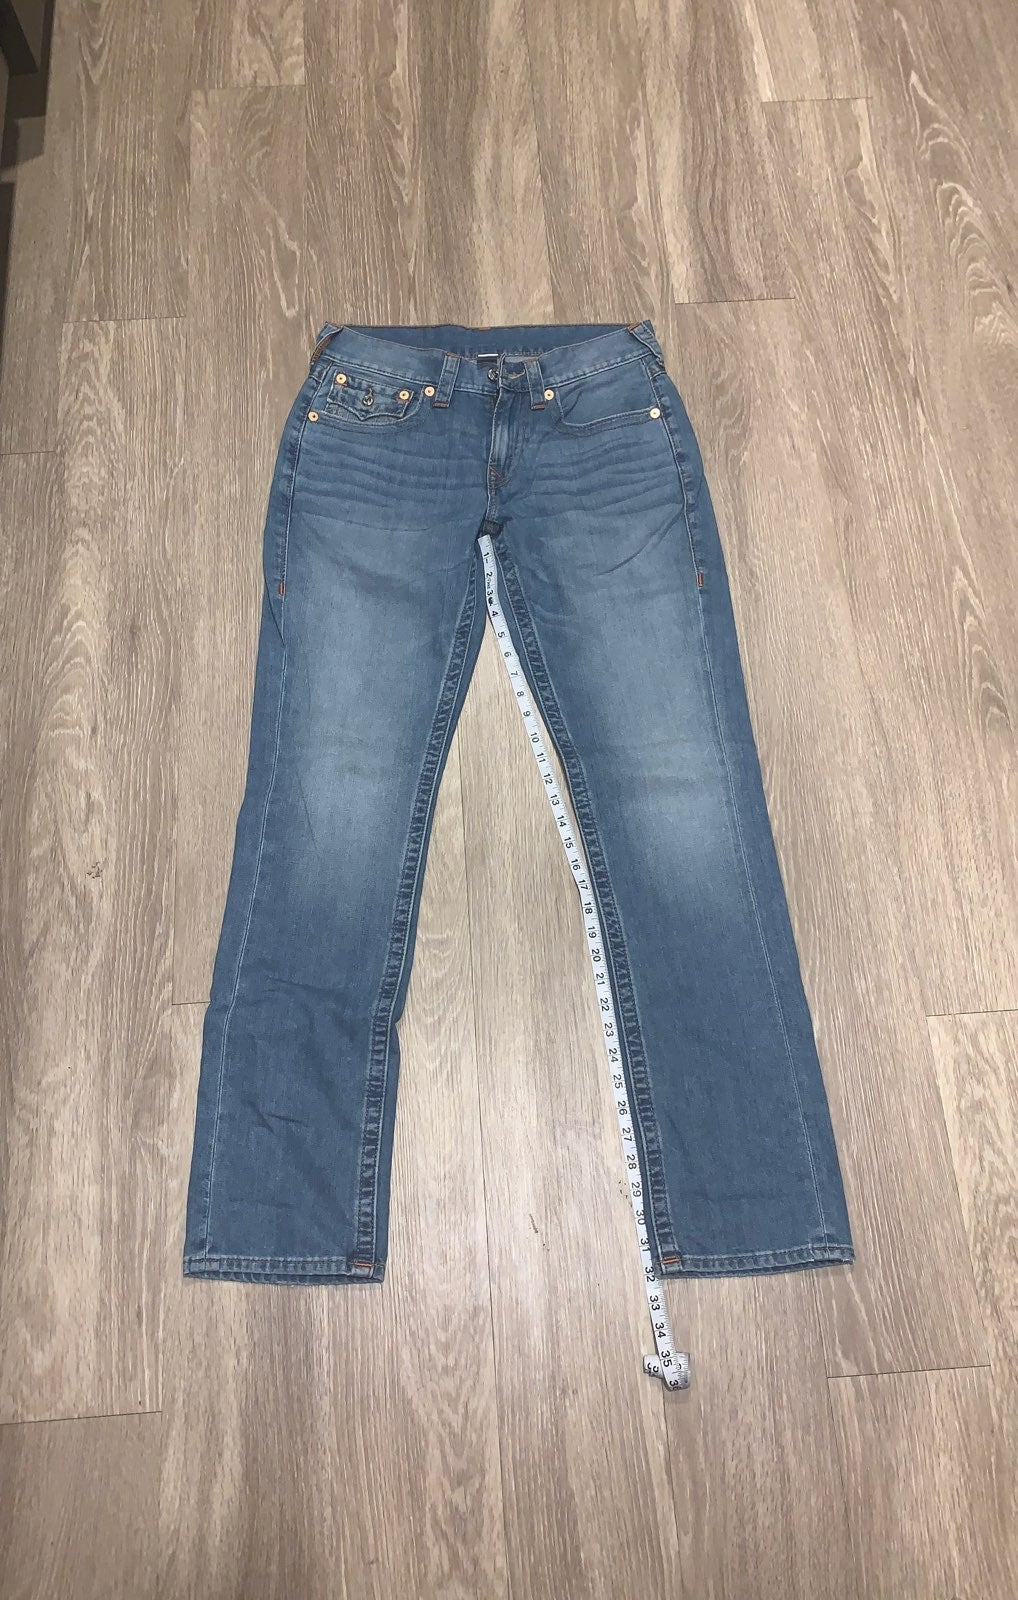 Mens NWOT 31x32 True Religion Jeans